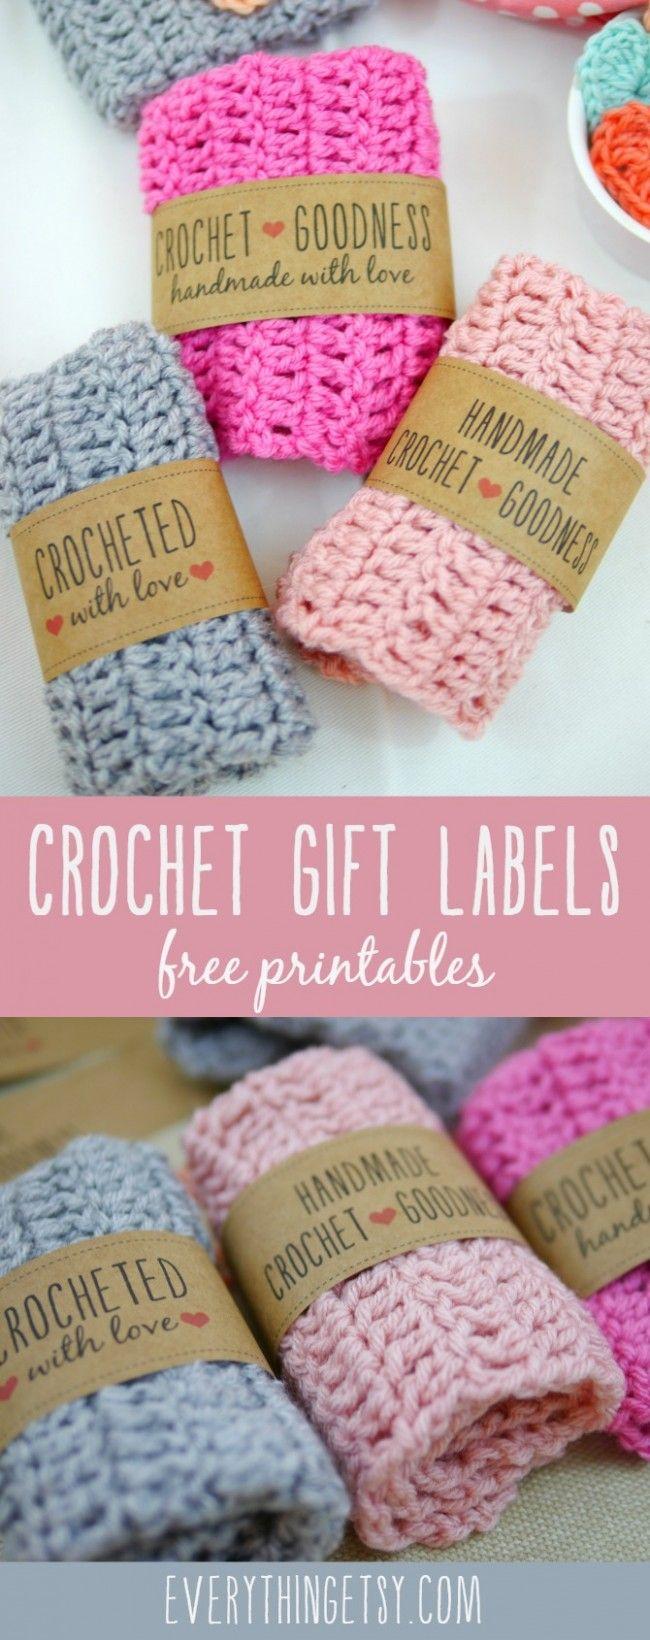 Free Printable Crochet Gift Labels (Everything Etsy) | Pinterest ...